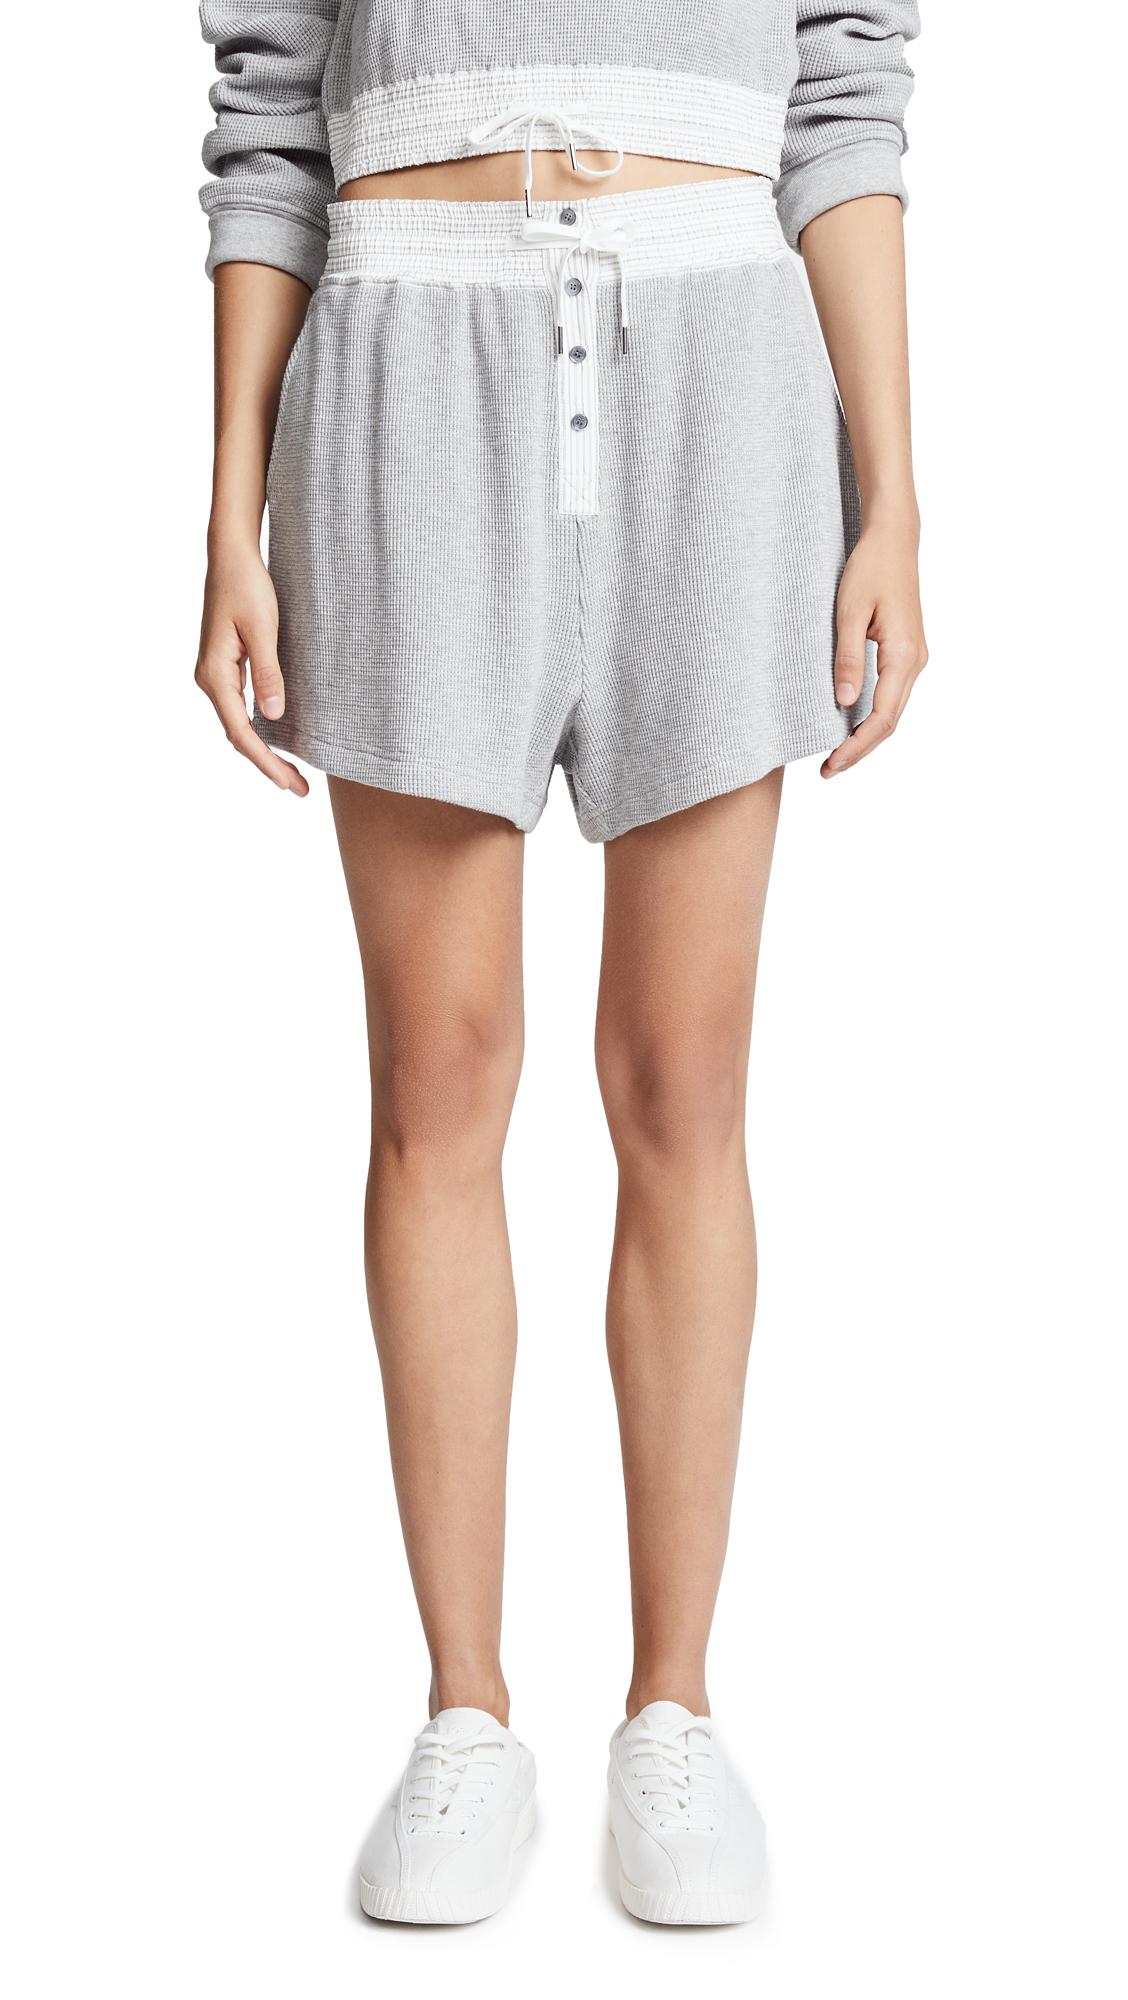 Striped Poplin-Trimmed Waffle-Knit Cotton Shorts in Heather Grey